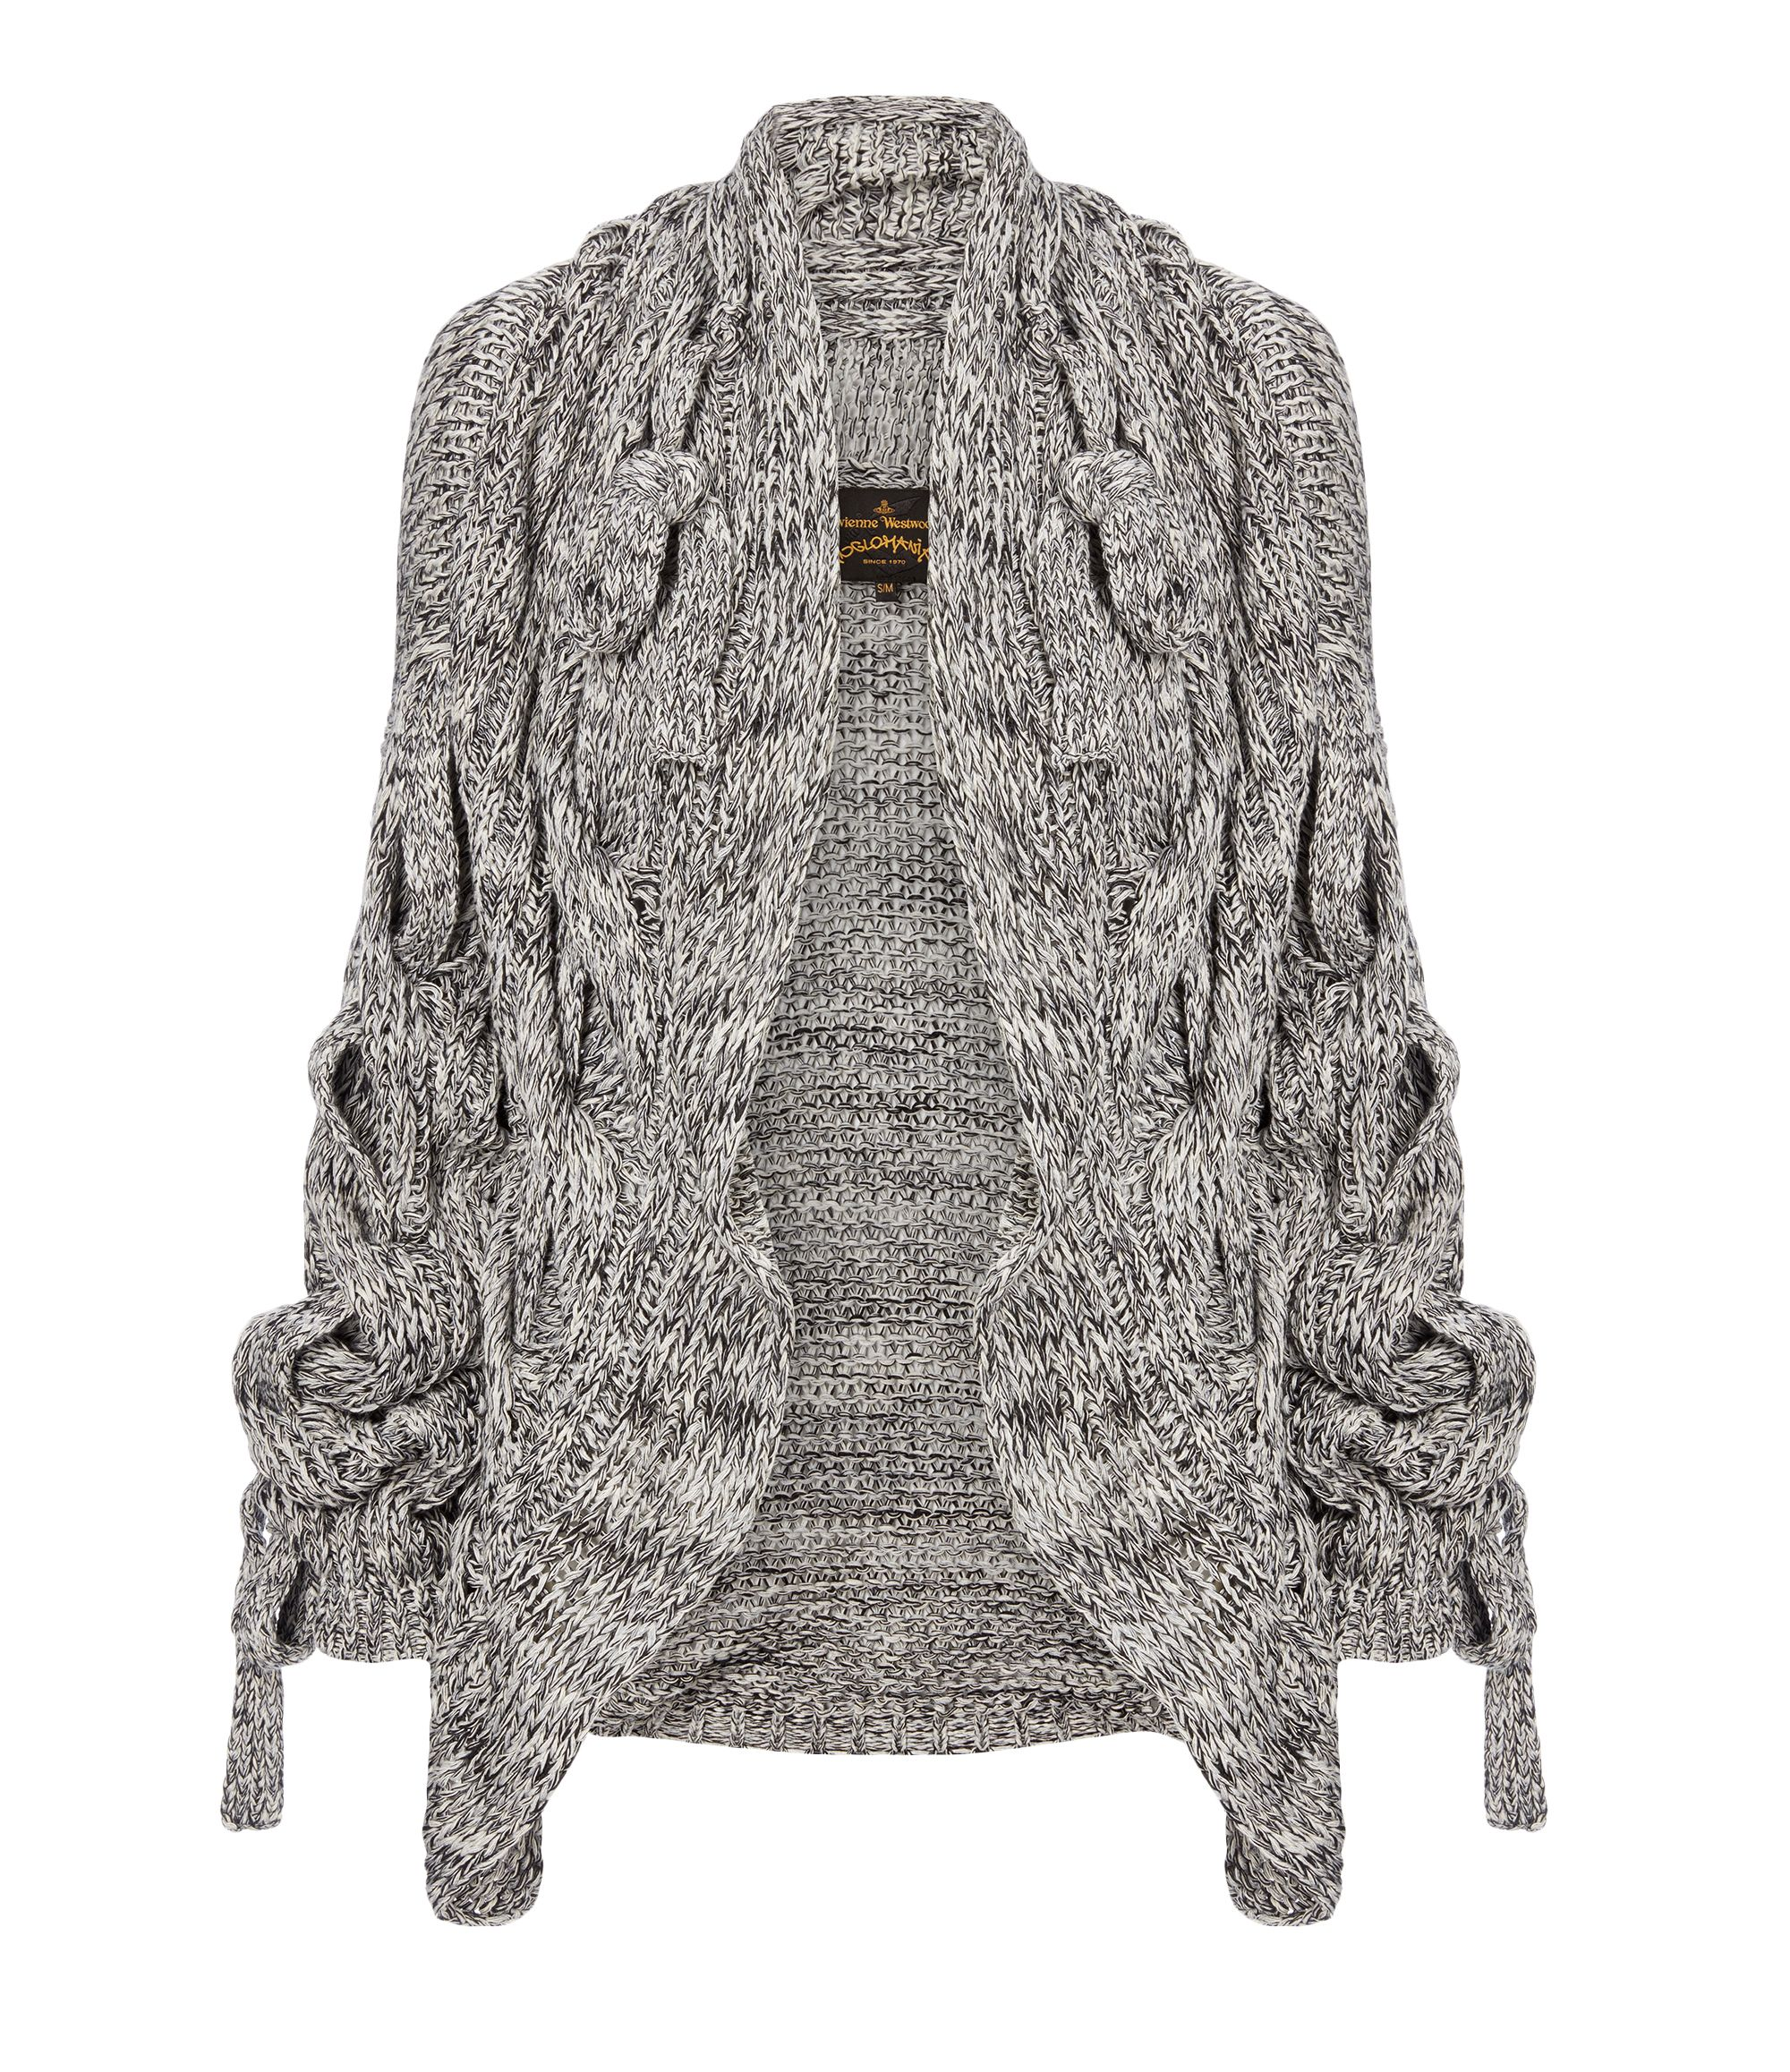 Grey Chunky Knit Cardigan | Style to wear | Pinterest | Chunky ...